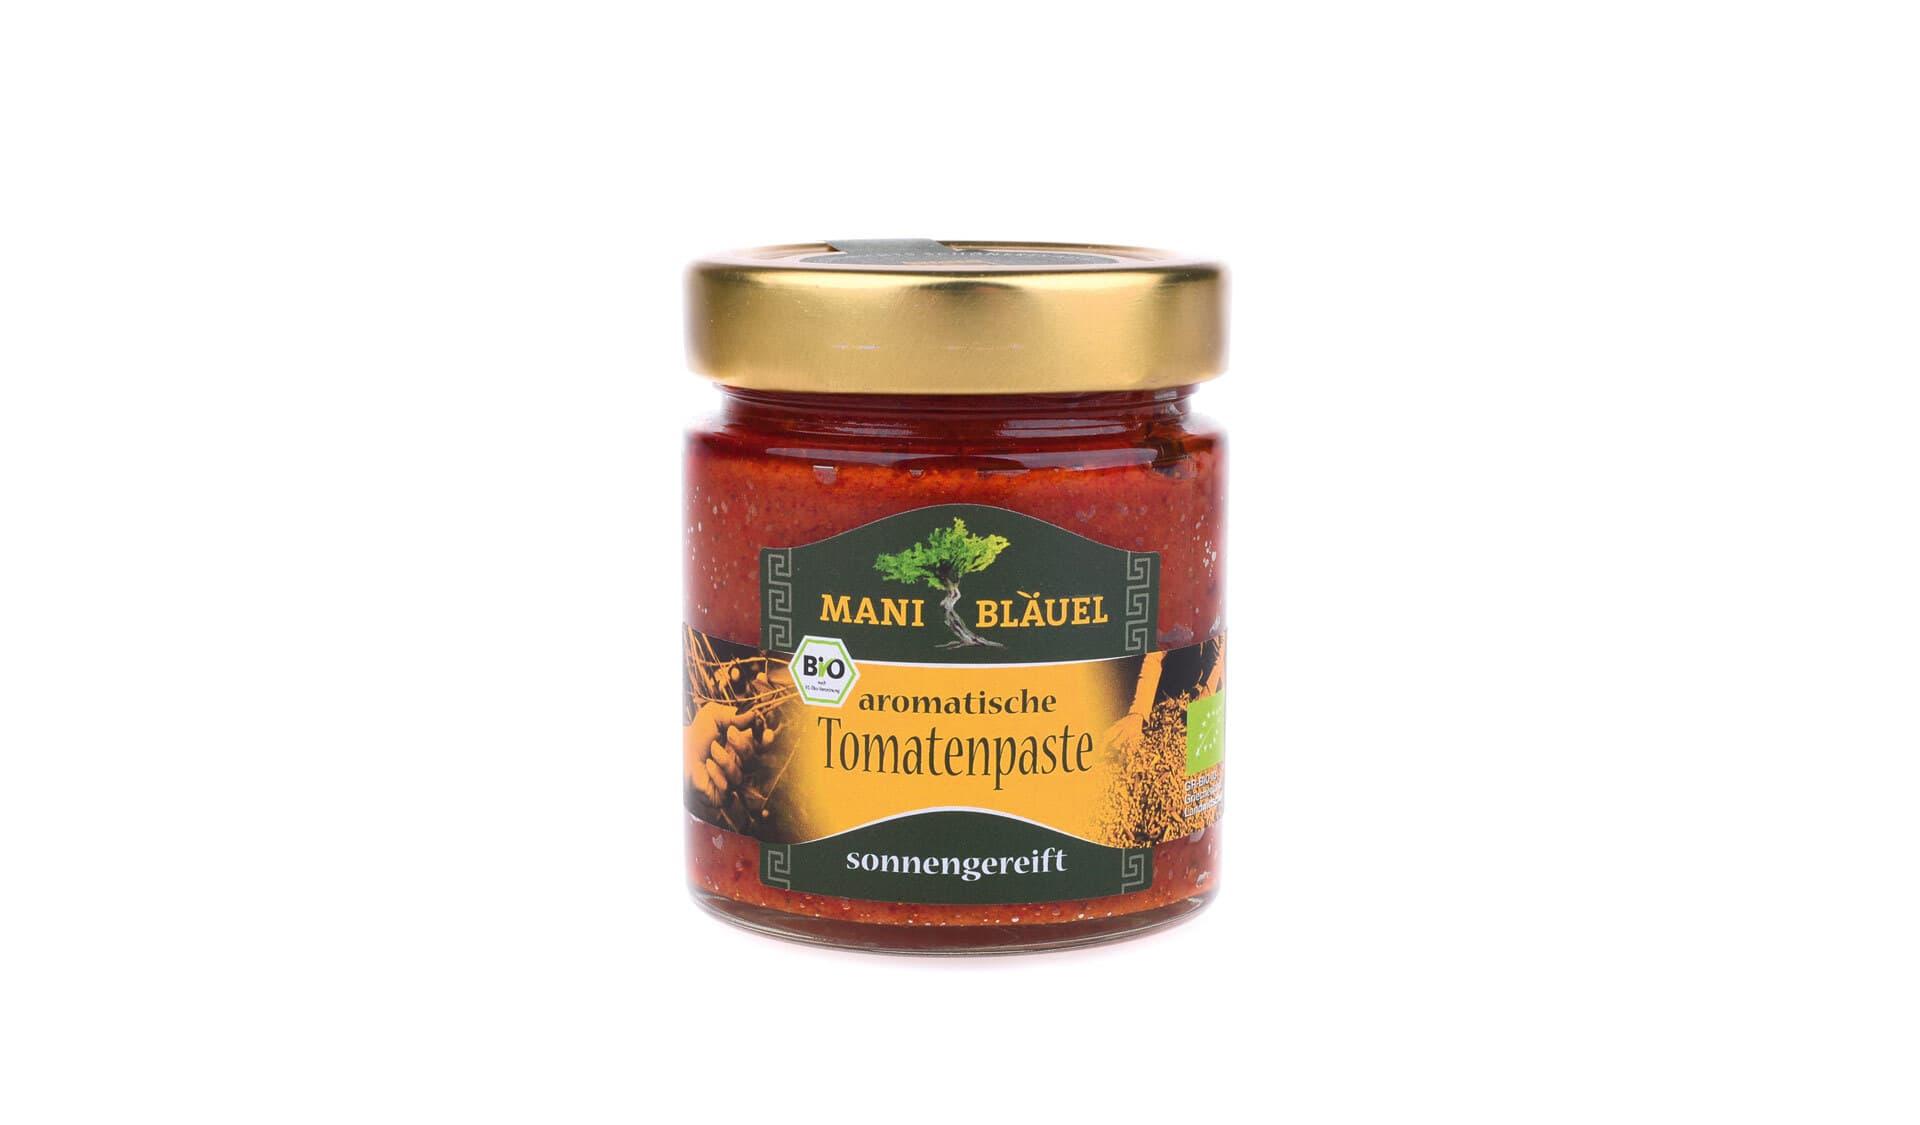 Mani Bläuel:  Aromatische Tomatenpaste